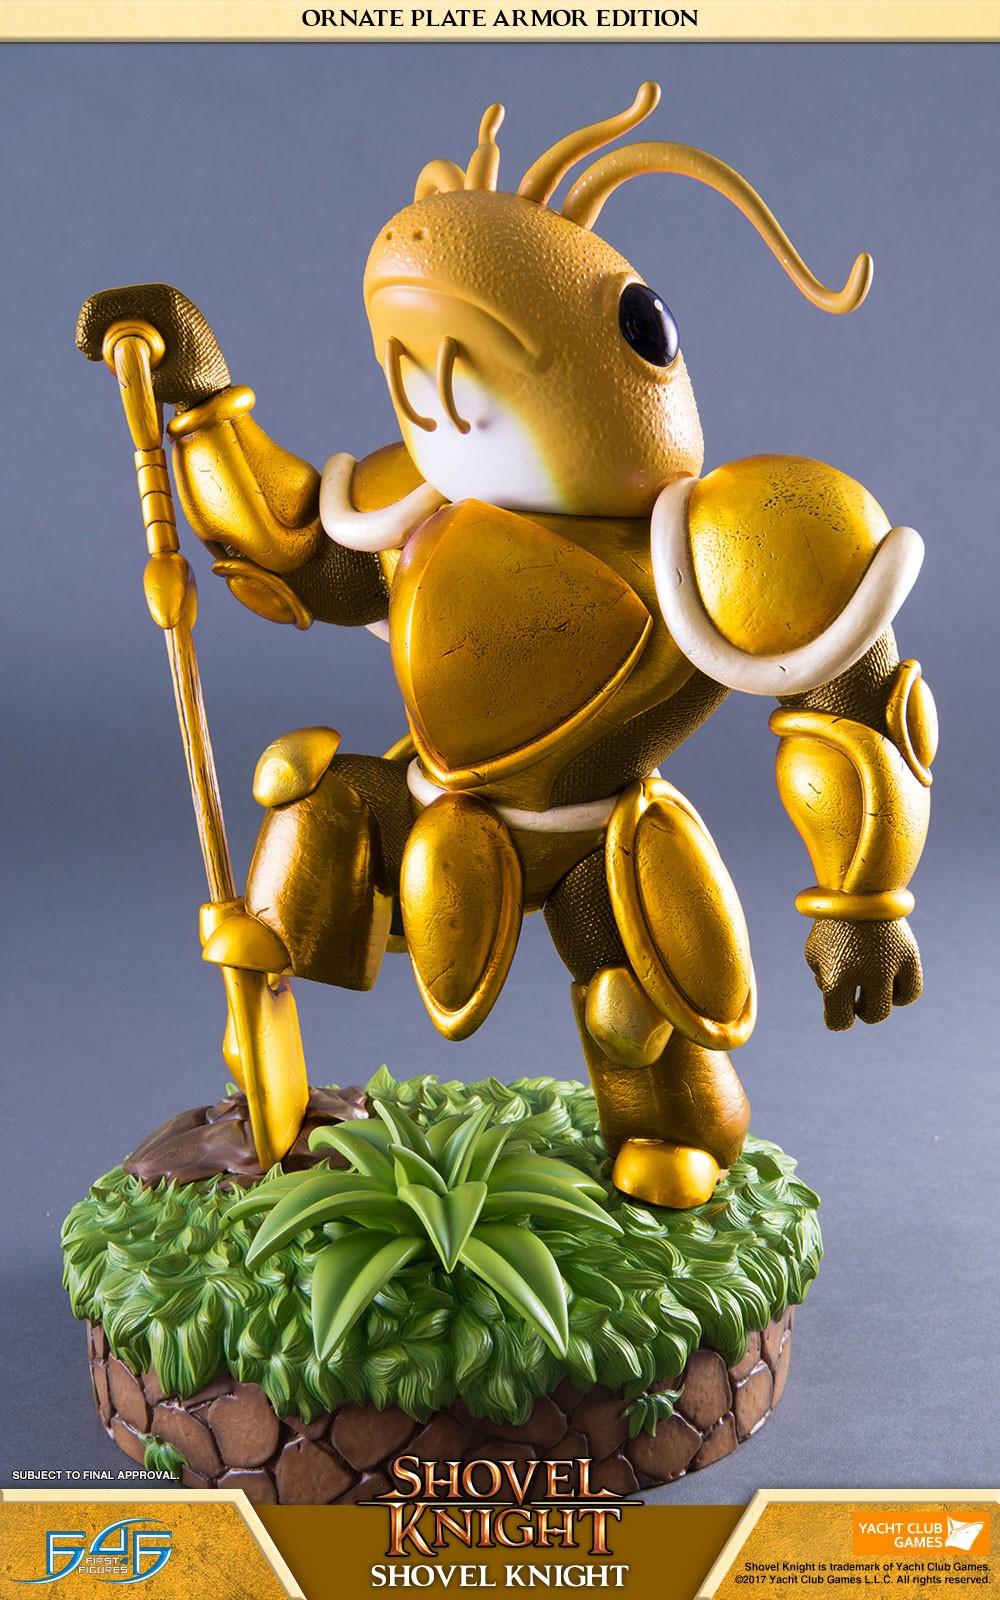 Shovel Knight Ornate Plate Armor Edition The complete shovel knight guide. shovel knight ornate plate armor edition